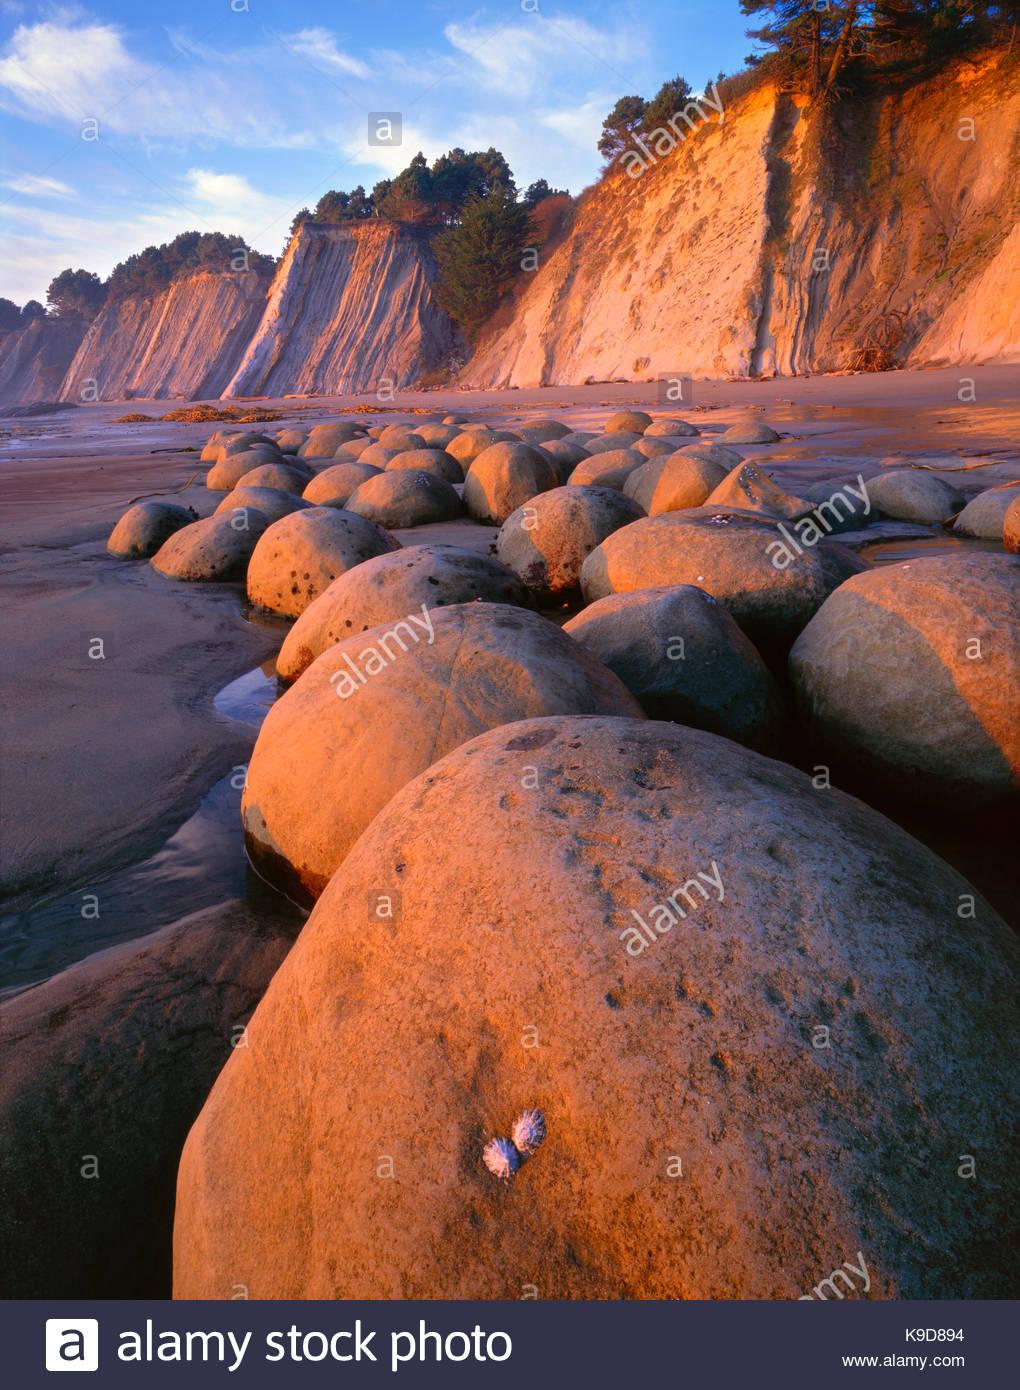 Sunset on Bowling Ball Beach, Schooner Gulch State Park, Mendocino Coast, California - Stock Image